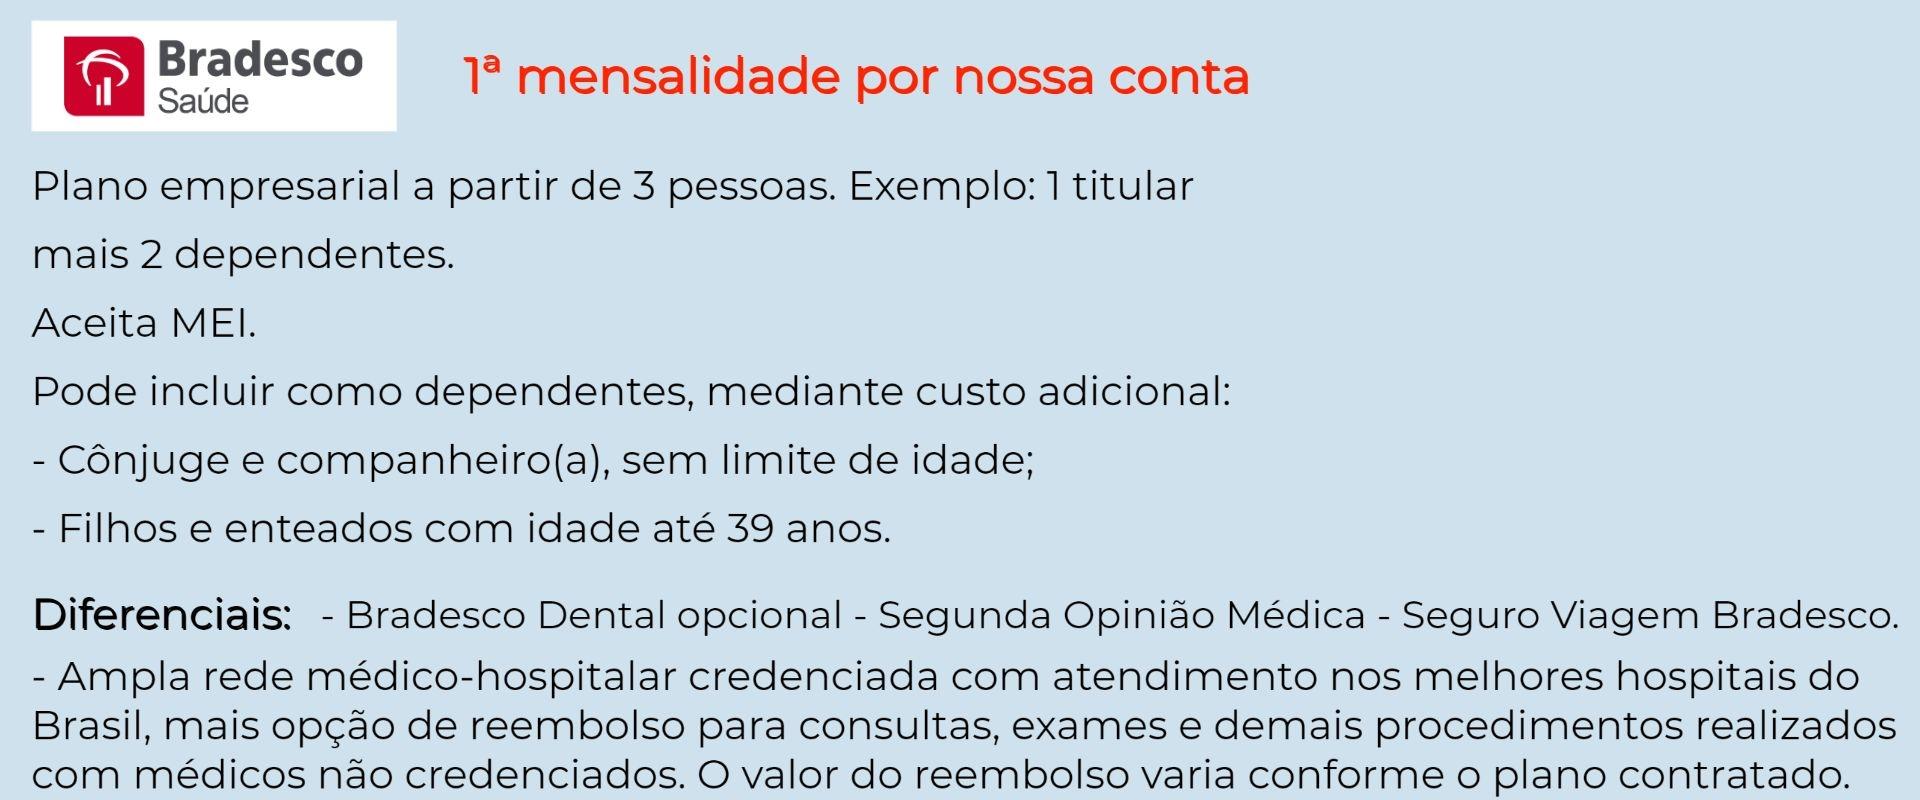 Bradesco Saúde Empresarial -  Cariacica